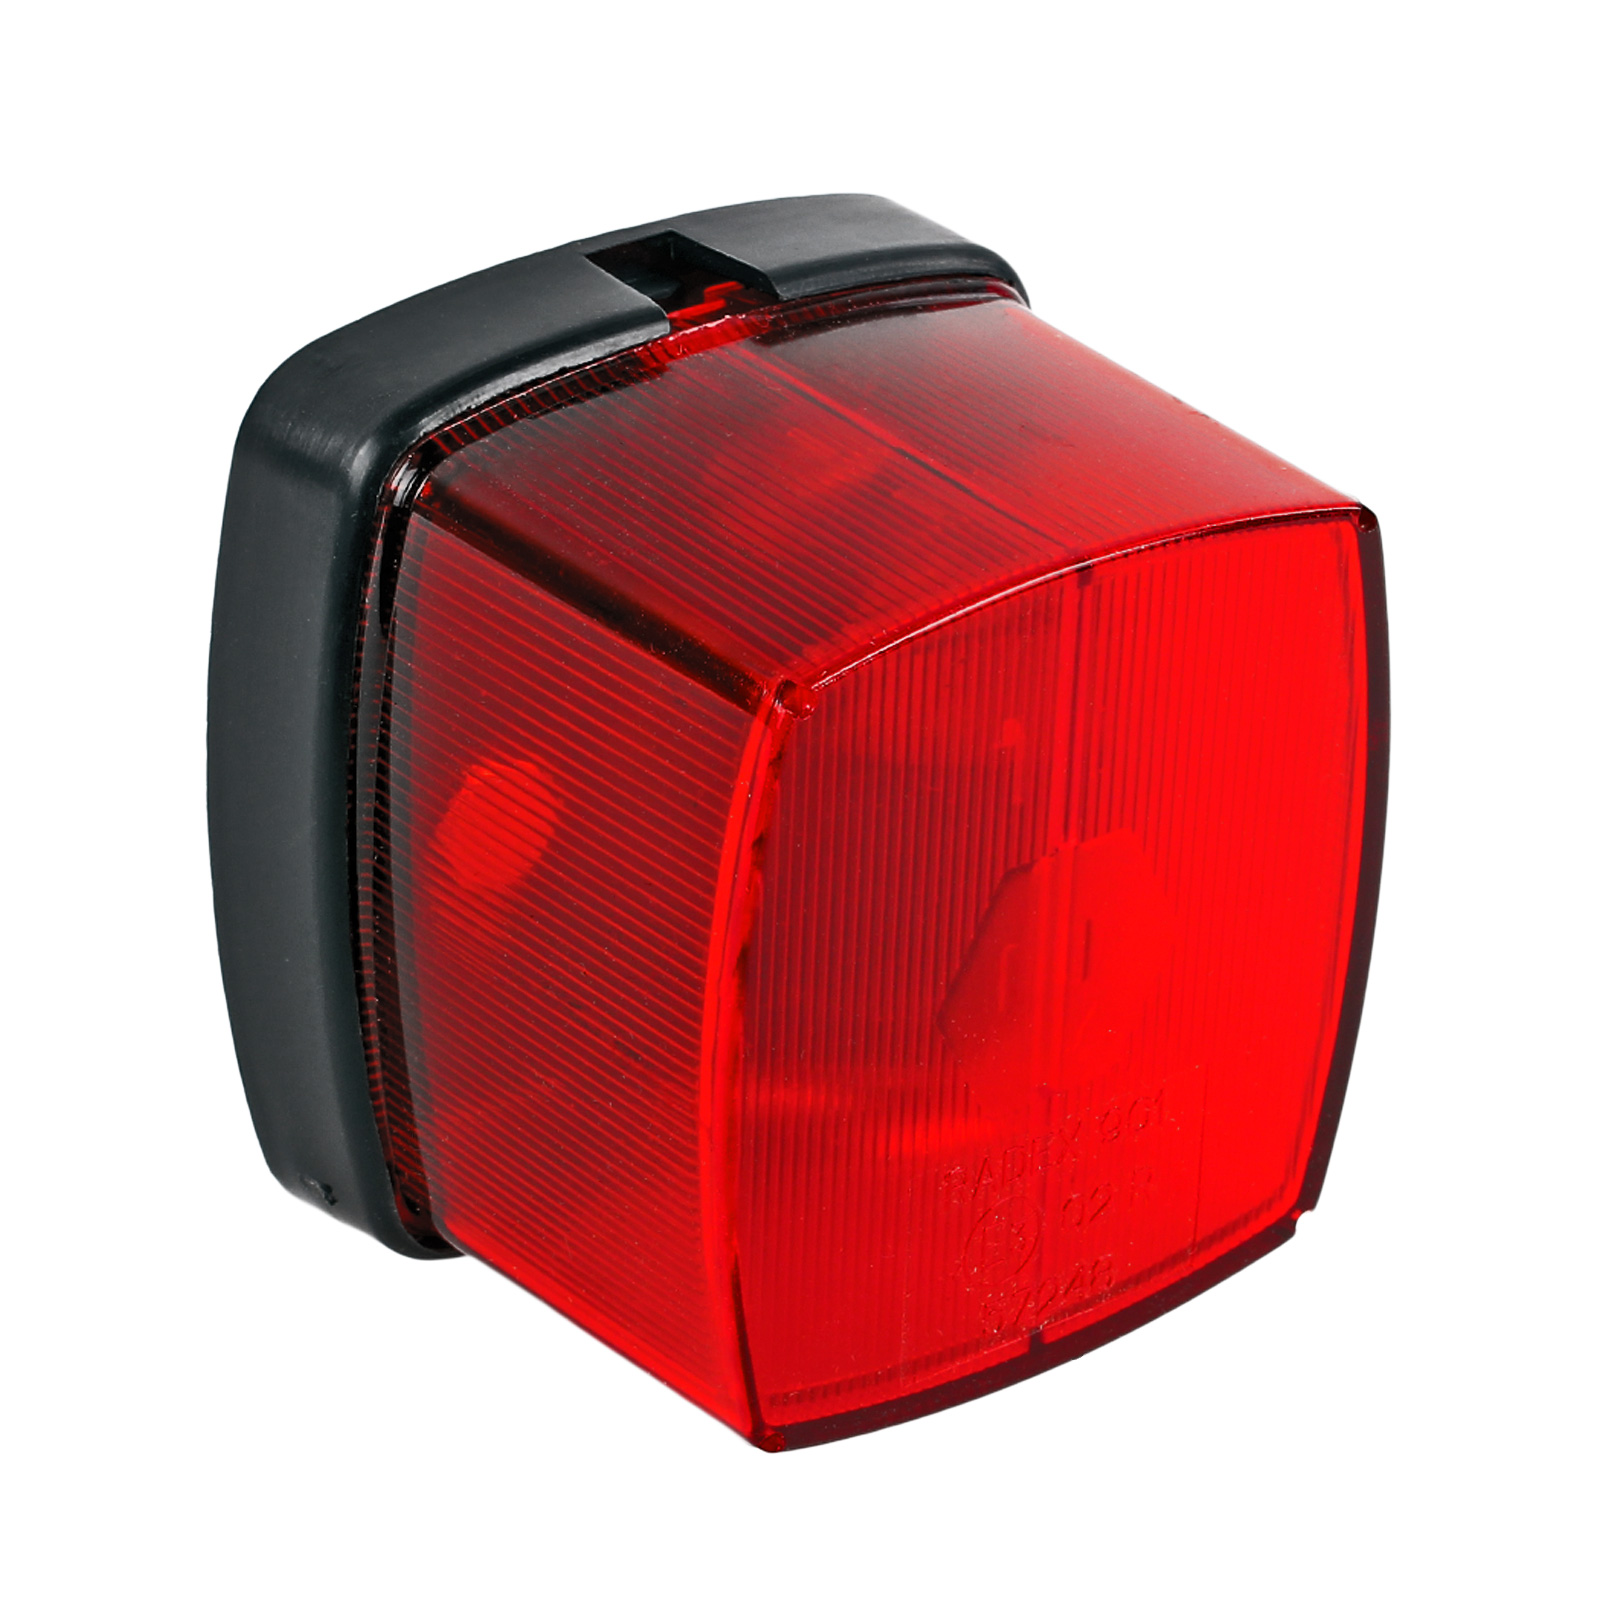 Positionsleuchte Rot E Prüfzeichen inkl Befestigungsmaterial